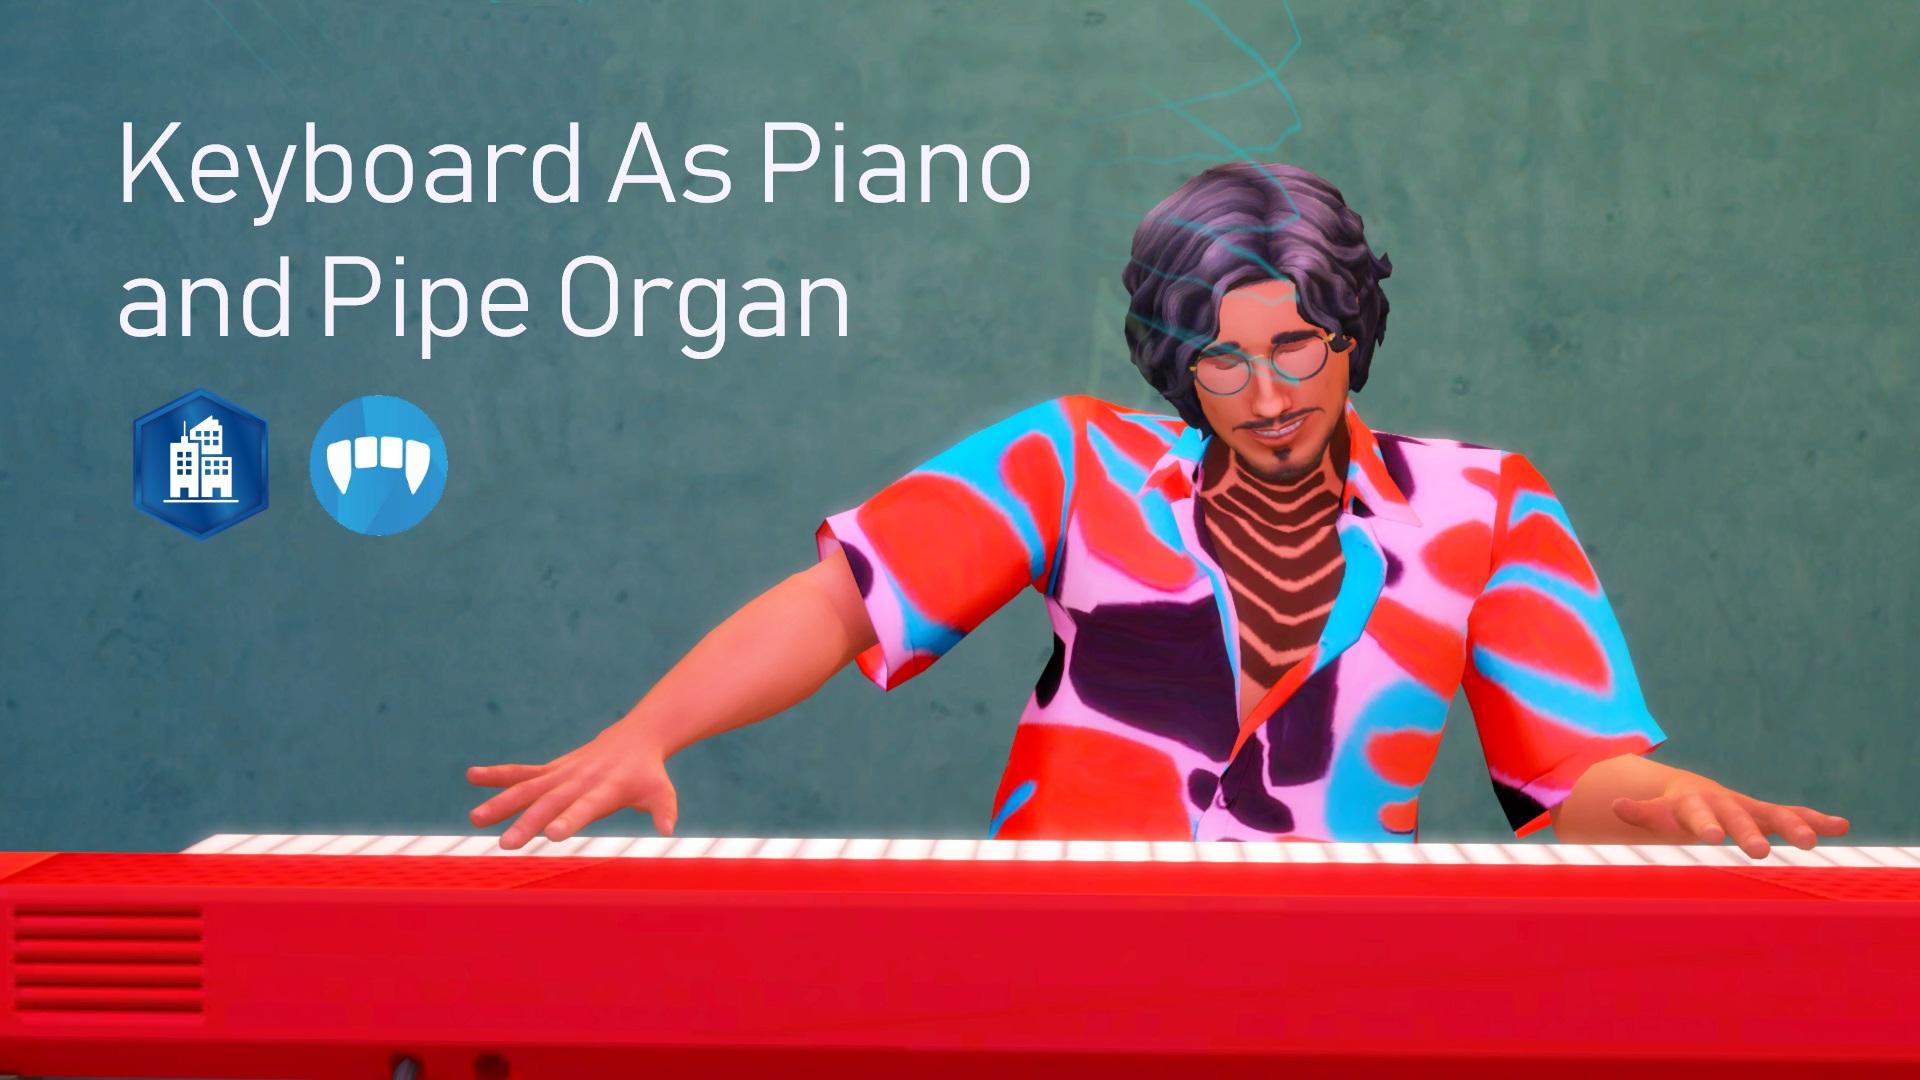 Мод Клавиатура как фортепиано и трубный орган